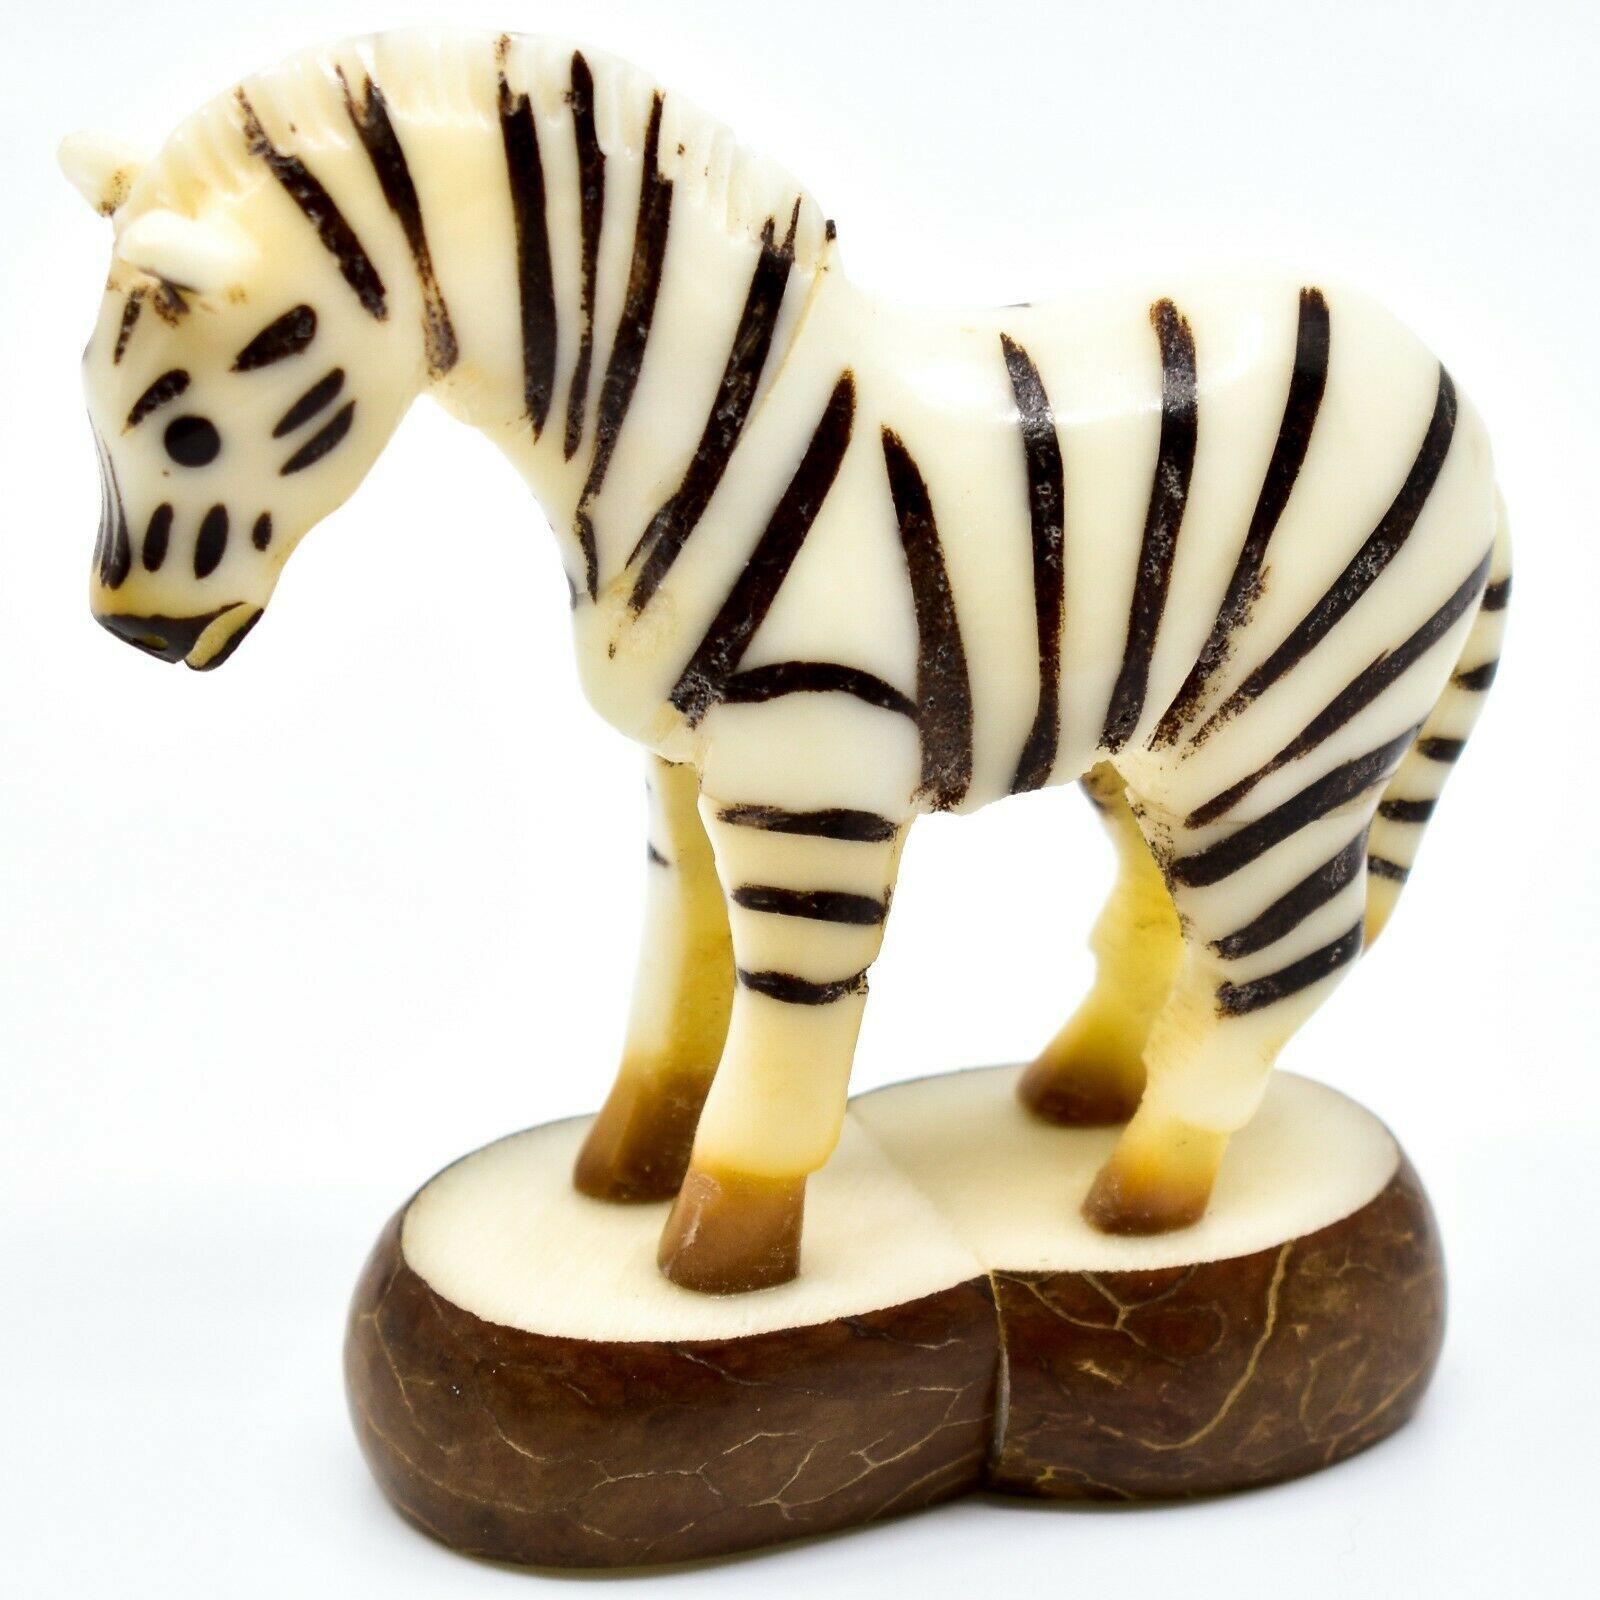 Hand Carved Tagua Nut Carving Zebra Figurine Made in Ecuador